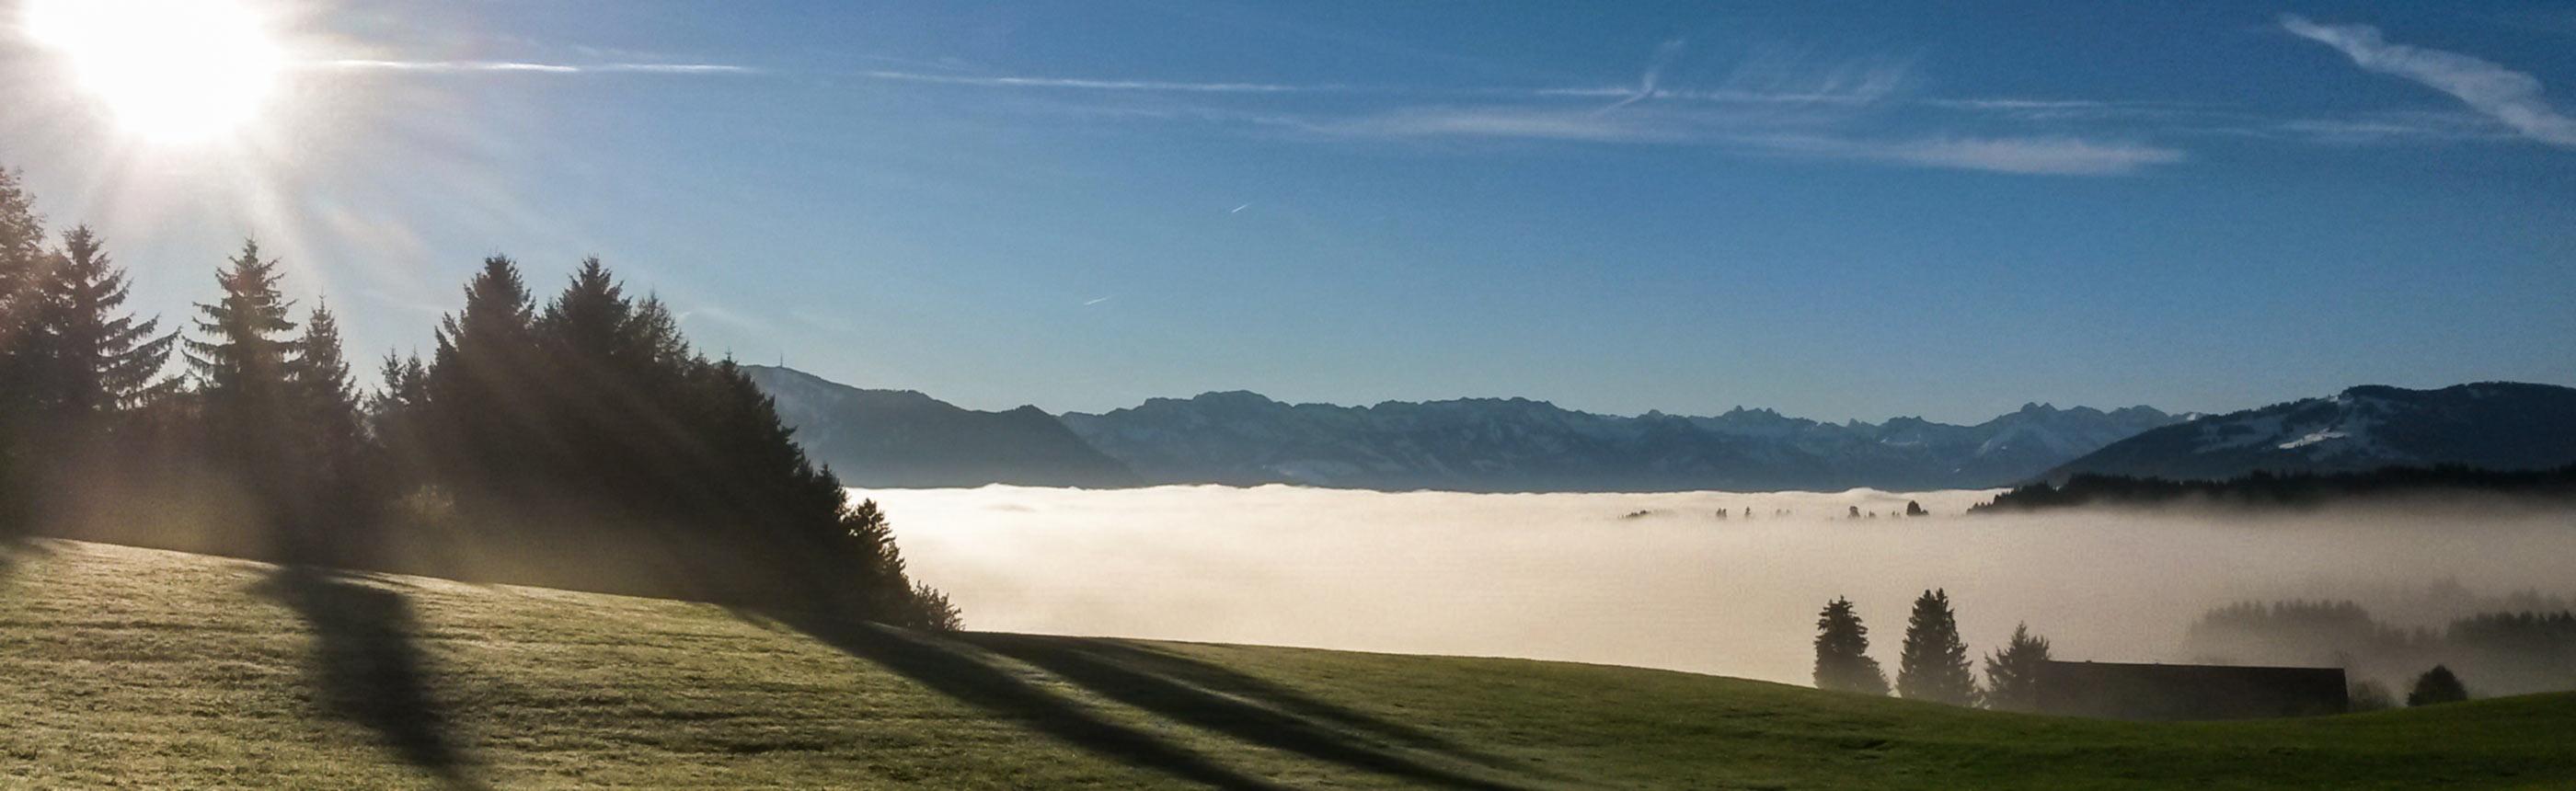 Nebelwald in Oberstdorf